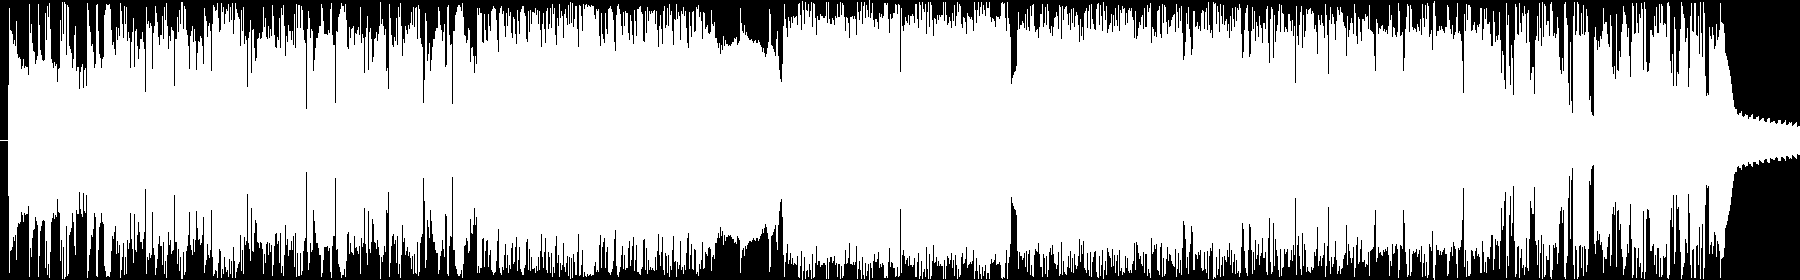 Serum Ammo audio waveform